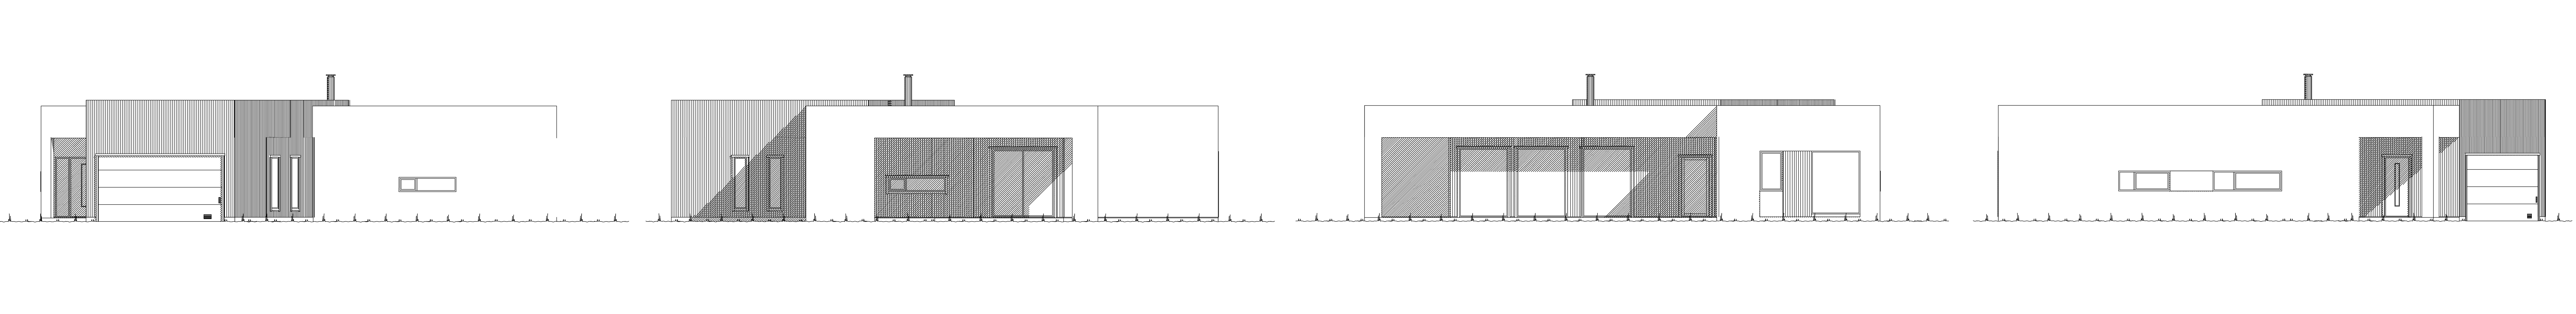 Storhornet fasade